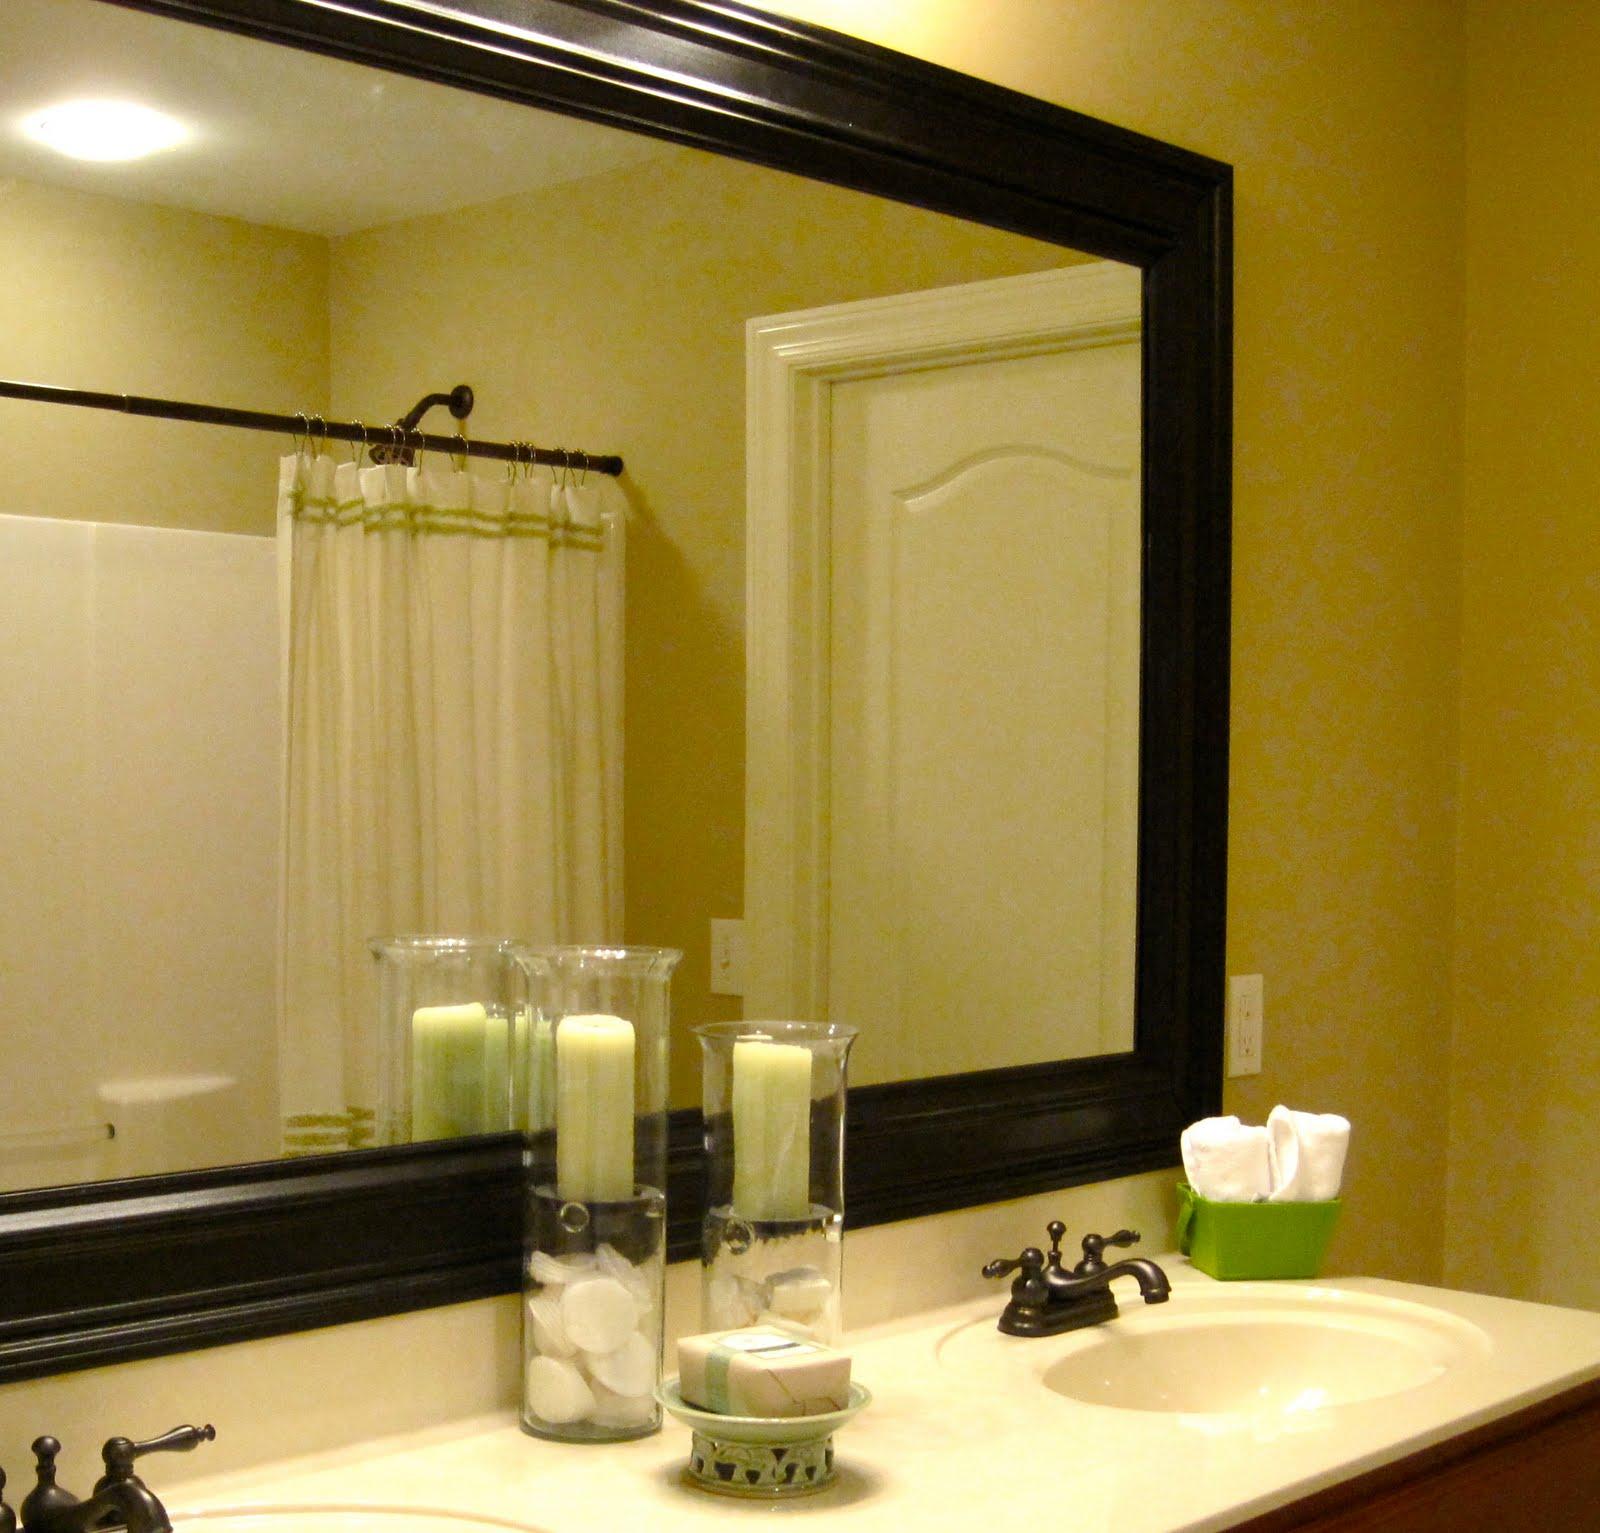 Framed-bathroom-mirrors